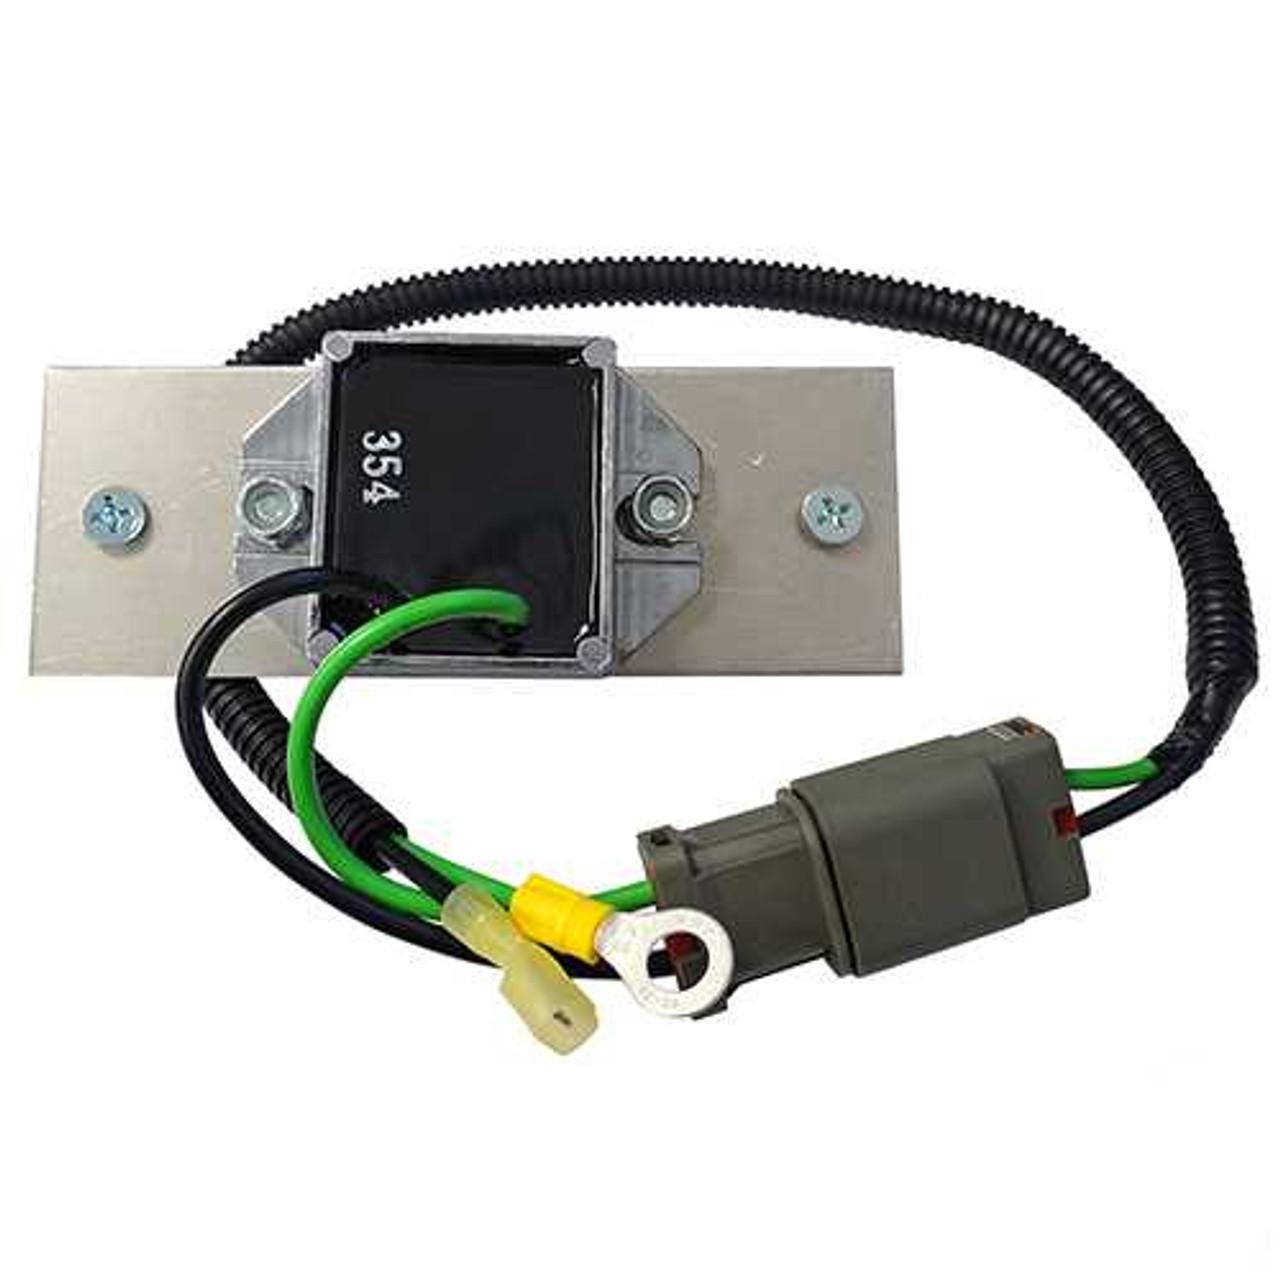 Voltage Reducer, 16-18V to 12V, 15 amp direct replacement OEM Part